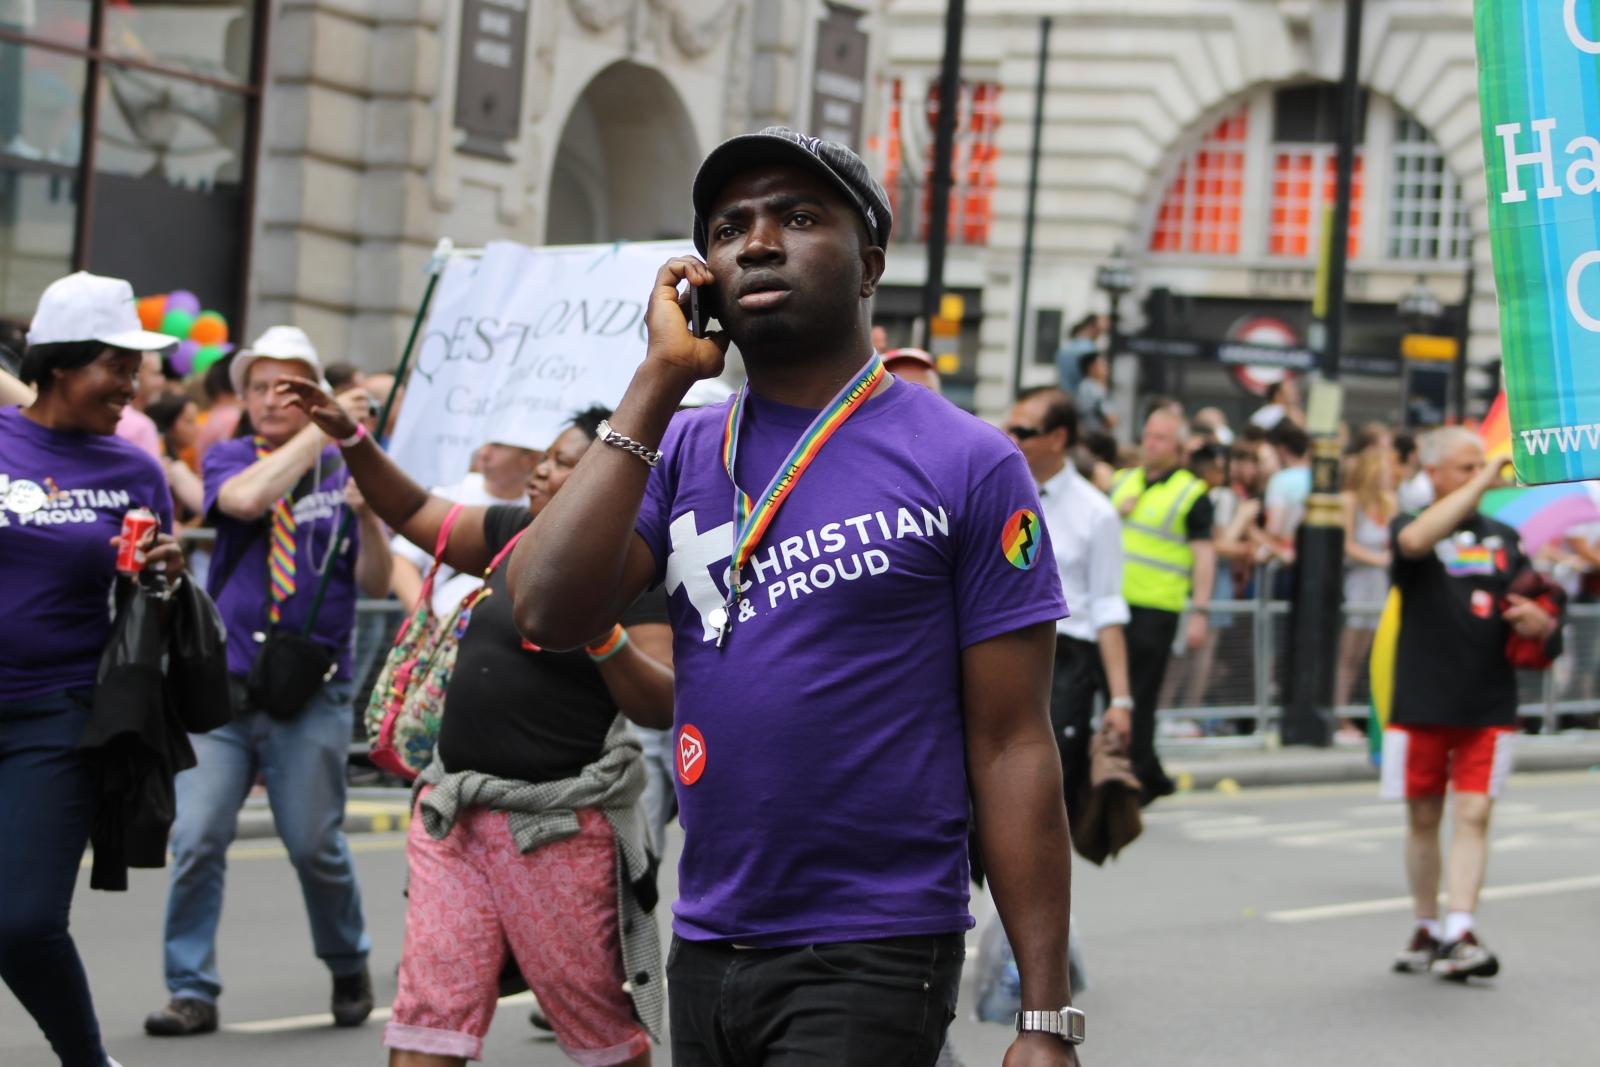 from Dangelo gay christians uk